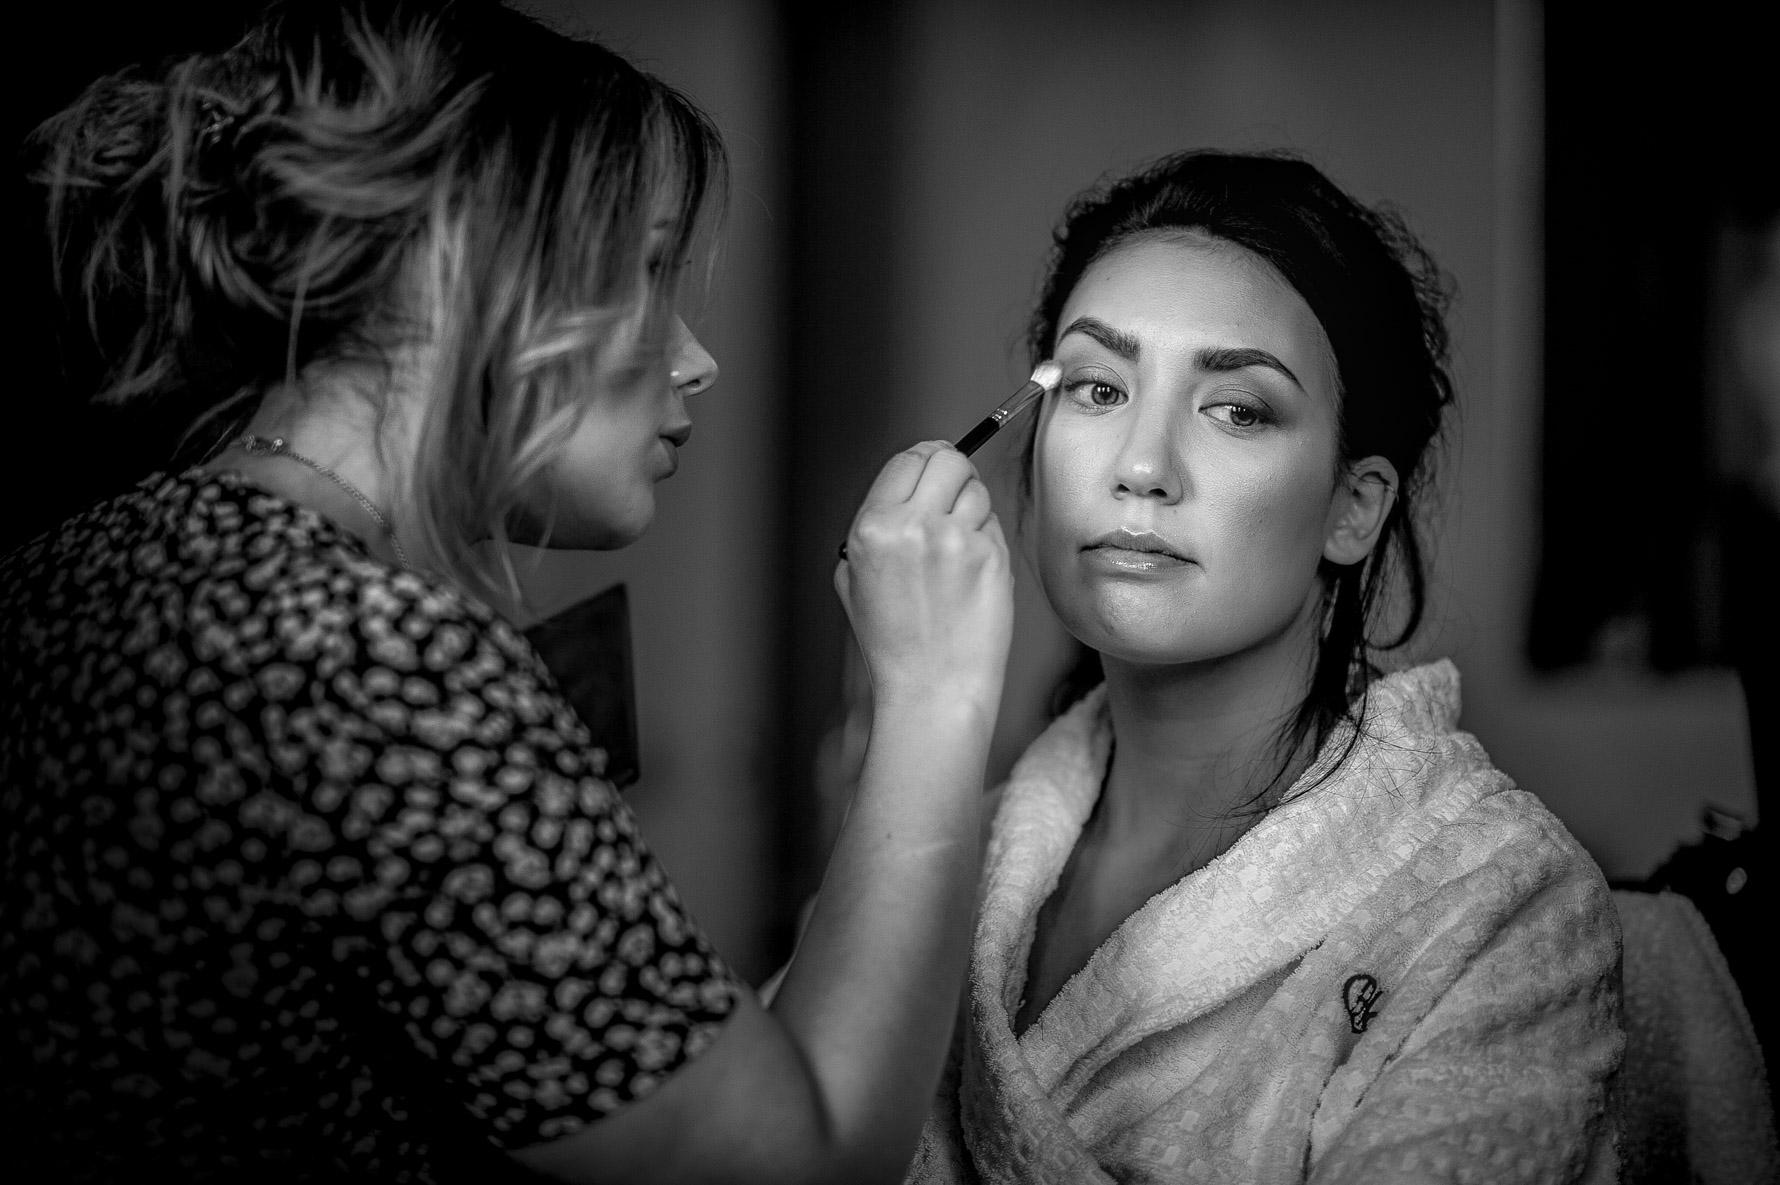 make up applied